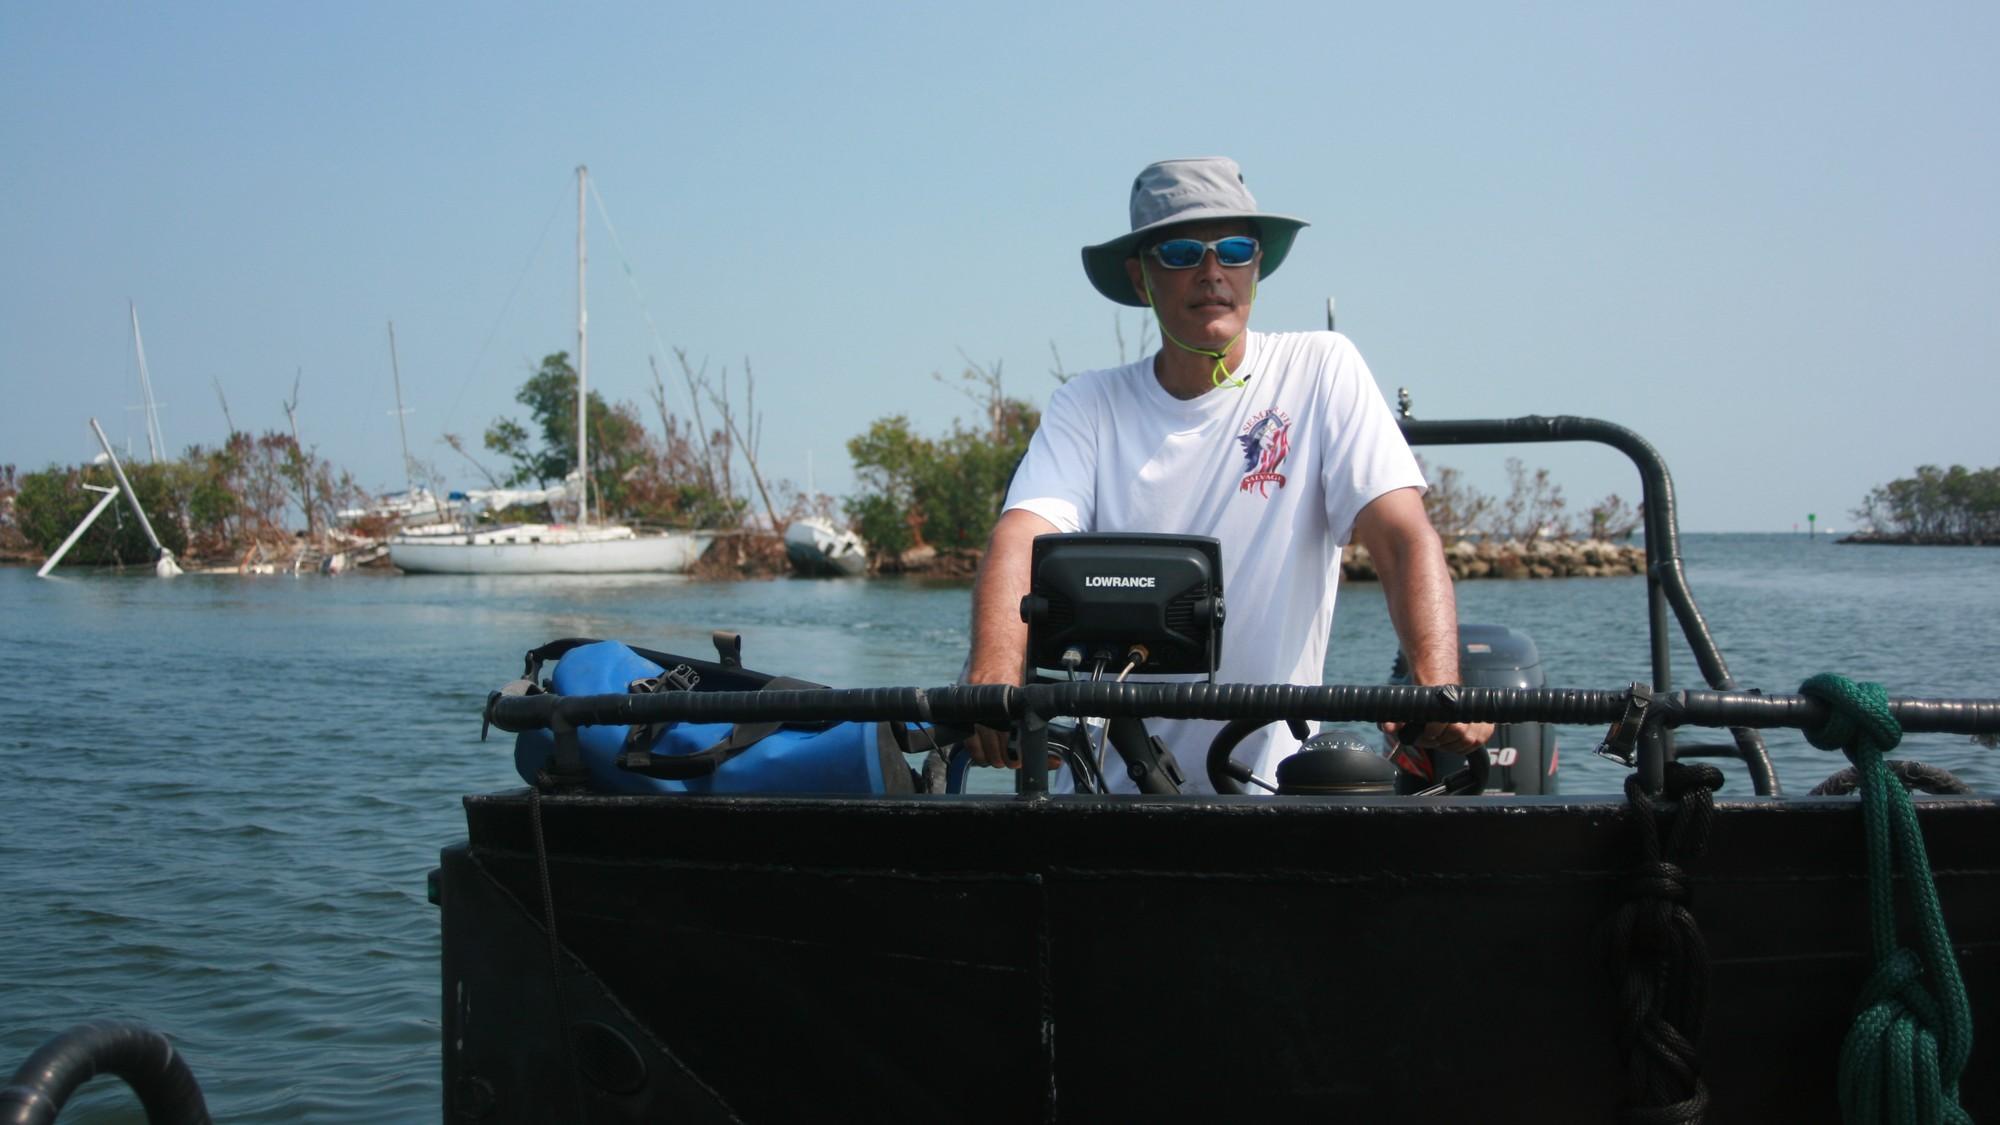 The Guys Cashing in on Hurricane Irma's Boat Destruction - VICE